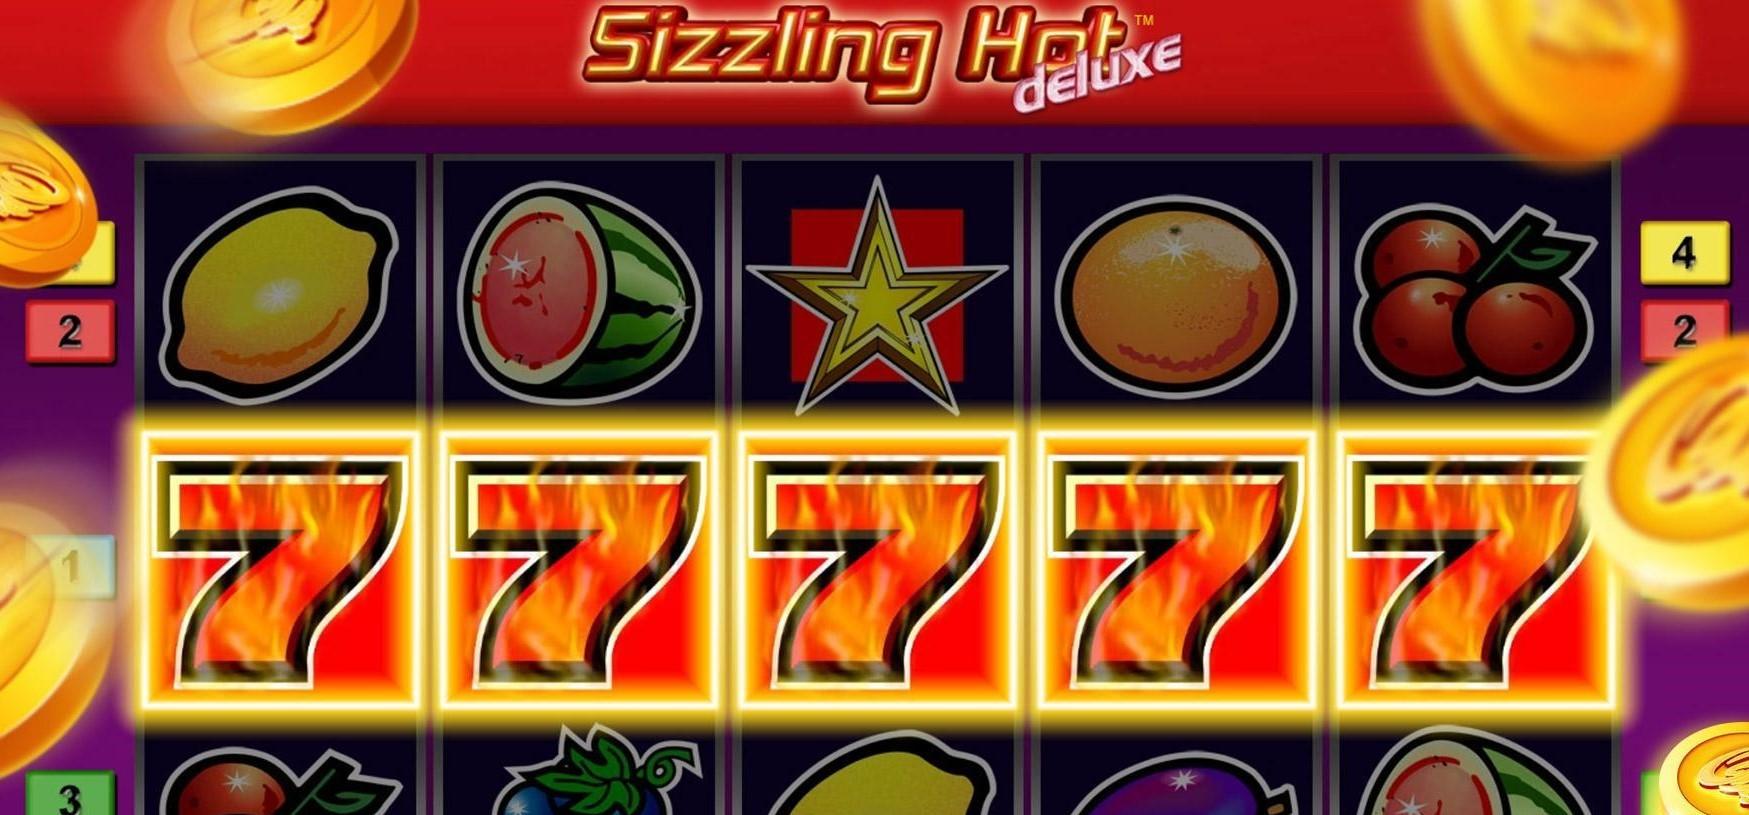 online slot oyunlari avantajlari nelerdir